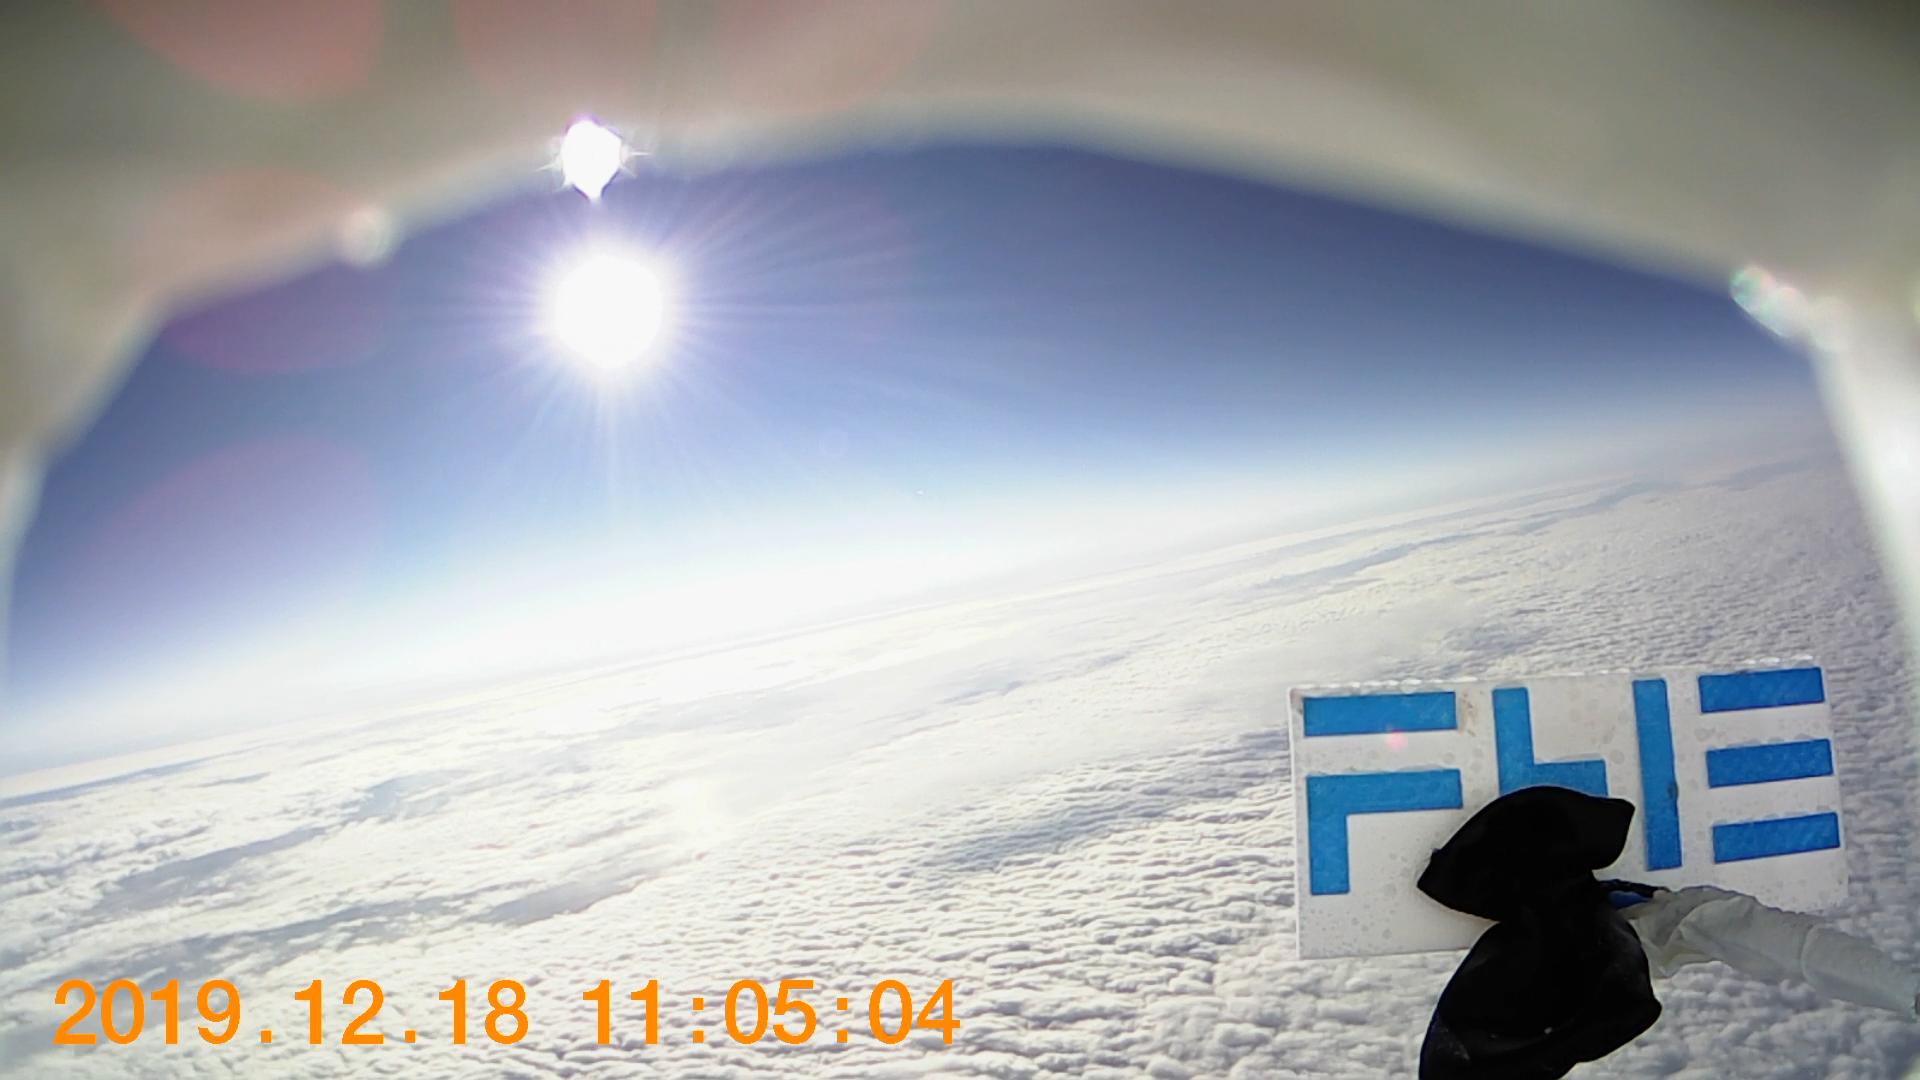 Stratosphärenflug